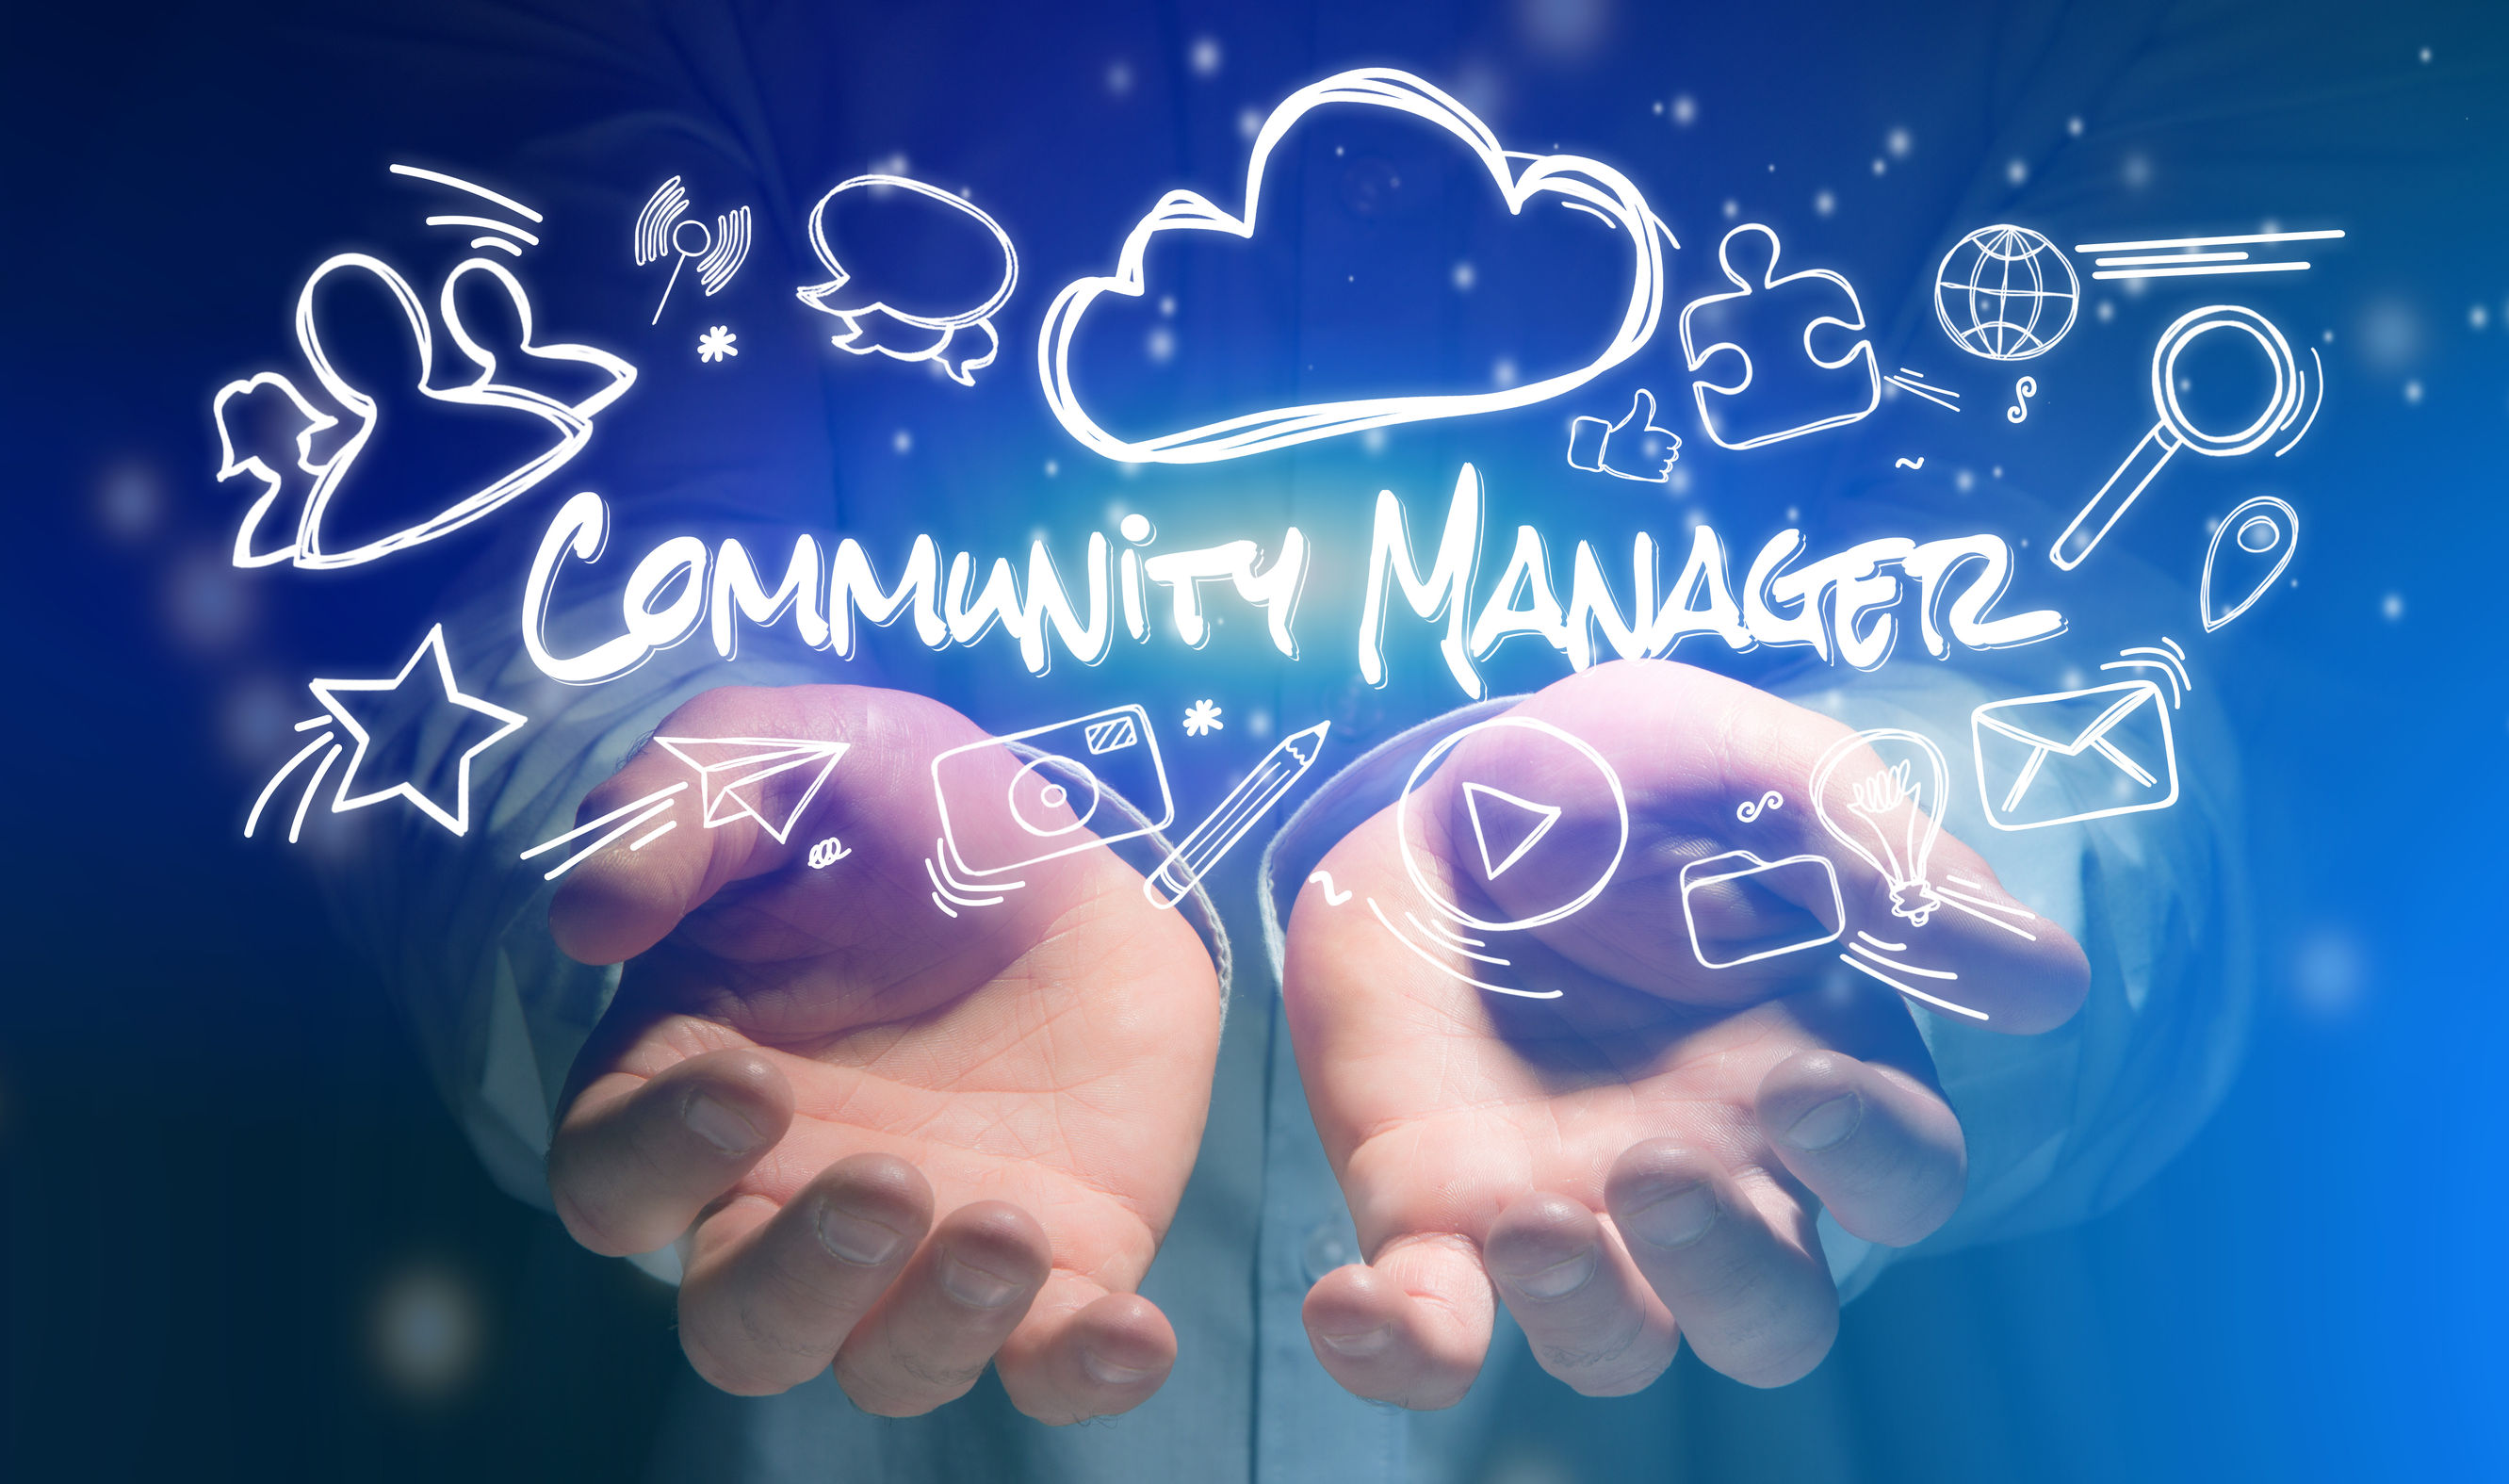 ¿Cuánto cobra un Community Manager en españa?